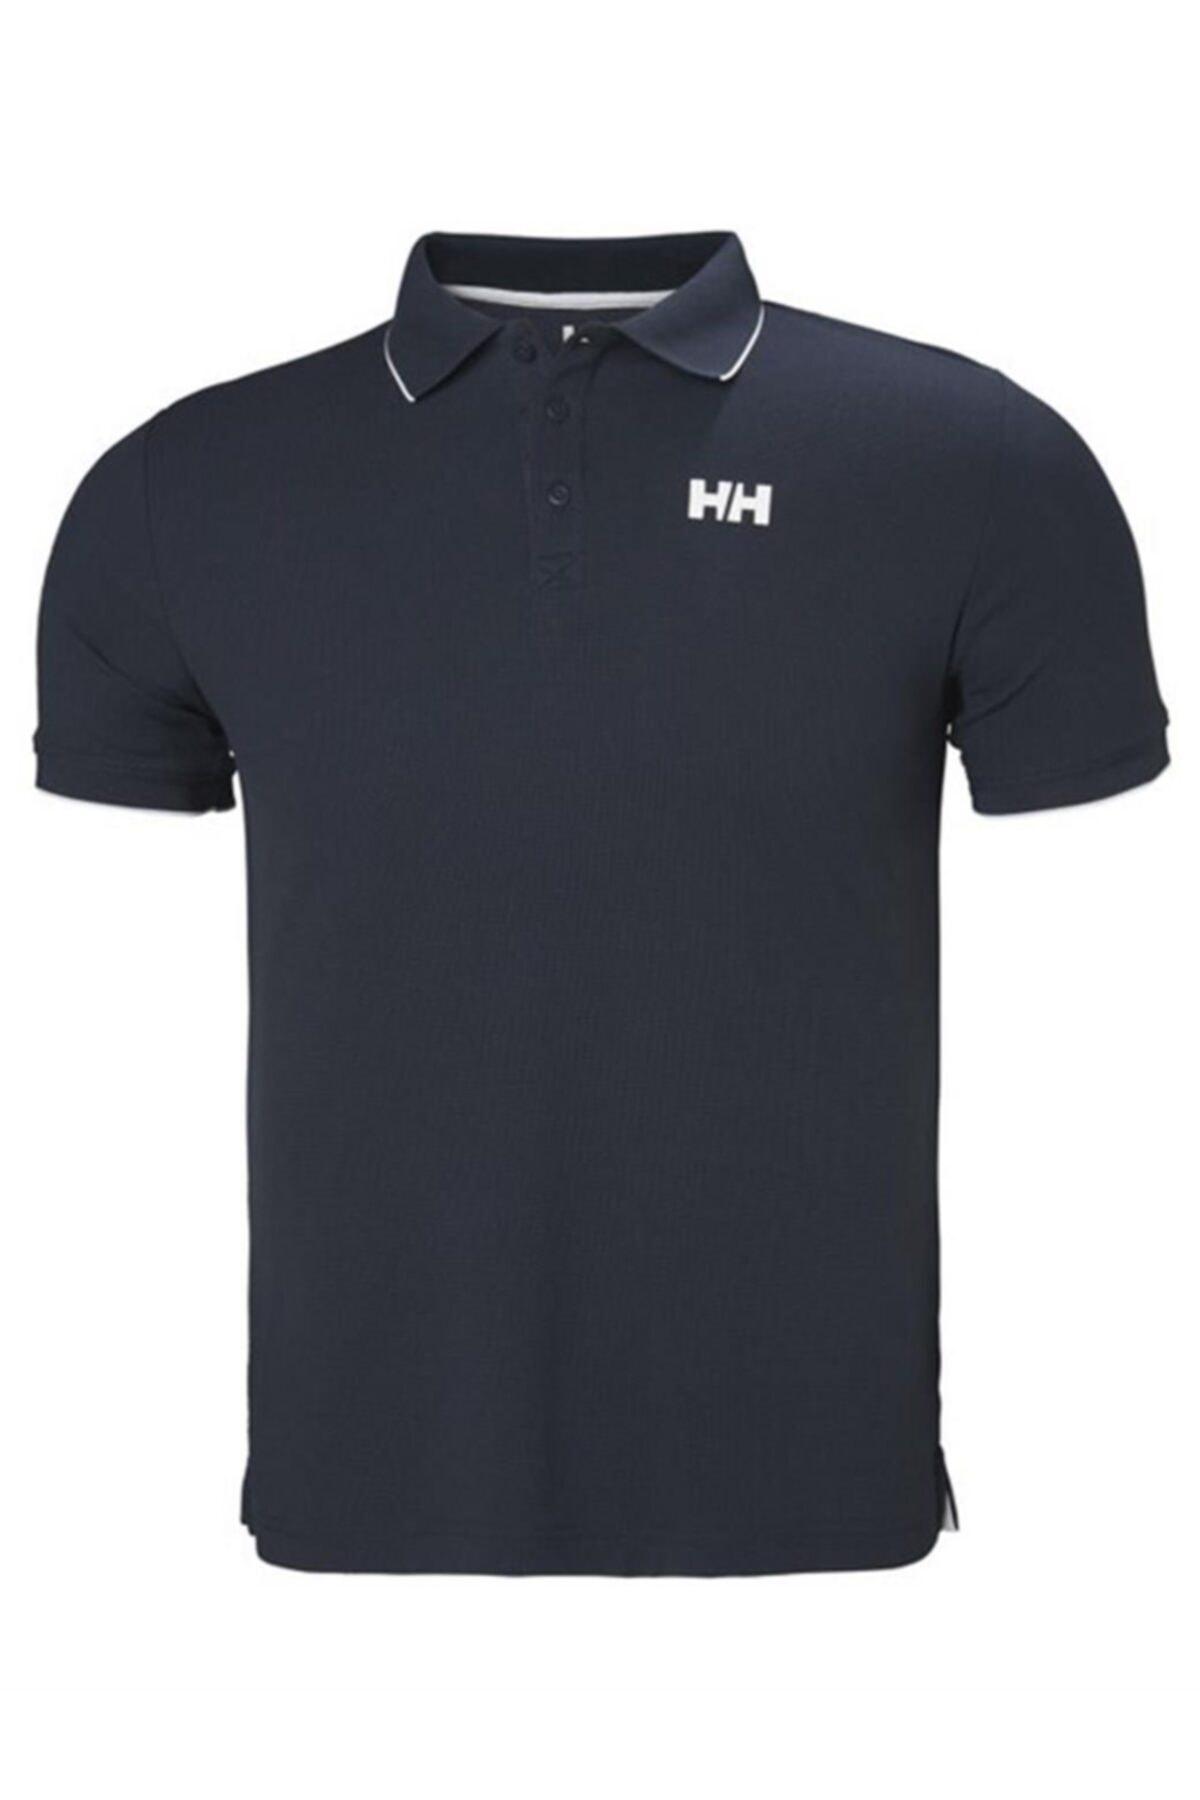 Helly Hansen Kos Polo Yaka Erkek T-shirt Lacivert 1